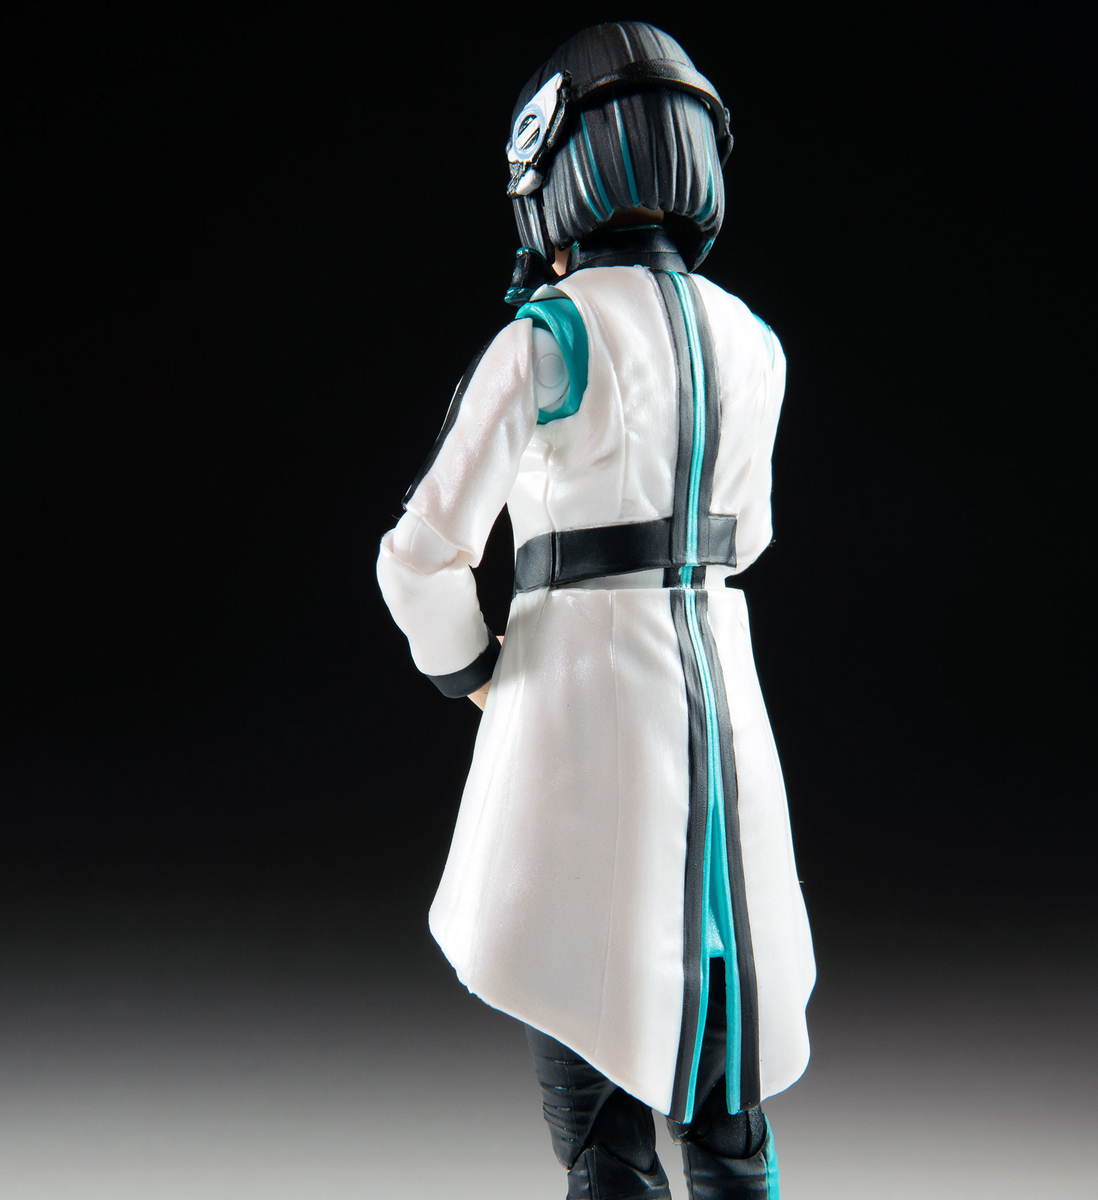 f:id:hiroban-ch:20210209012531j:plain